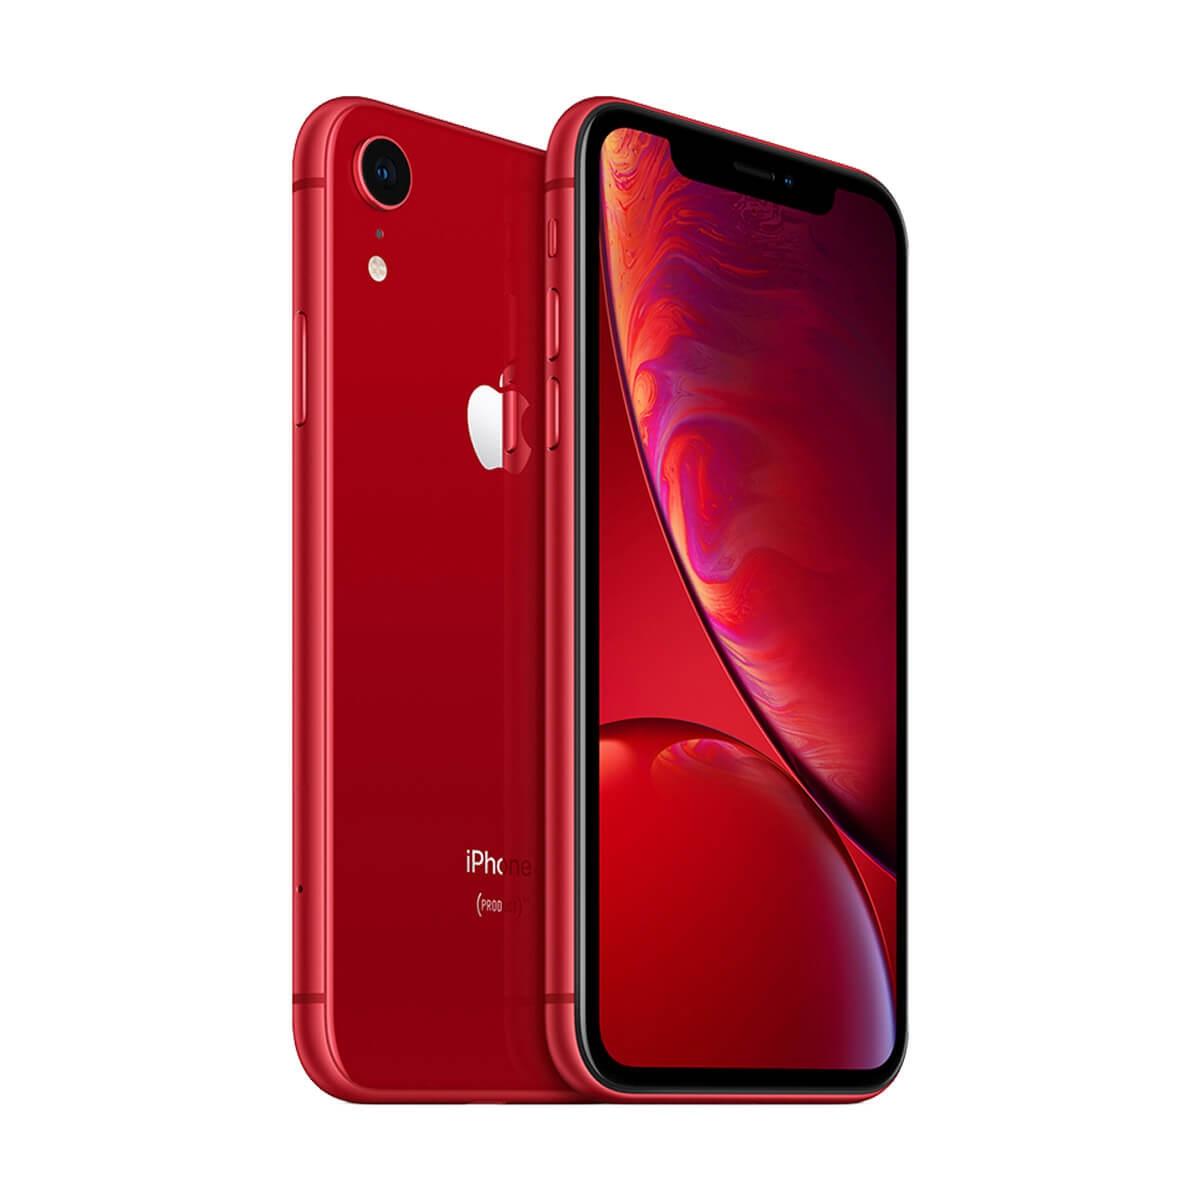 Apple iPhone XR(128G)最低價格及規格|傑昇通信~挑戰手機市場最低價